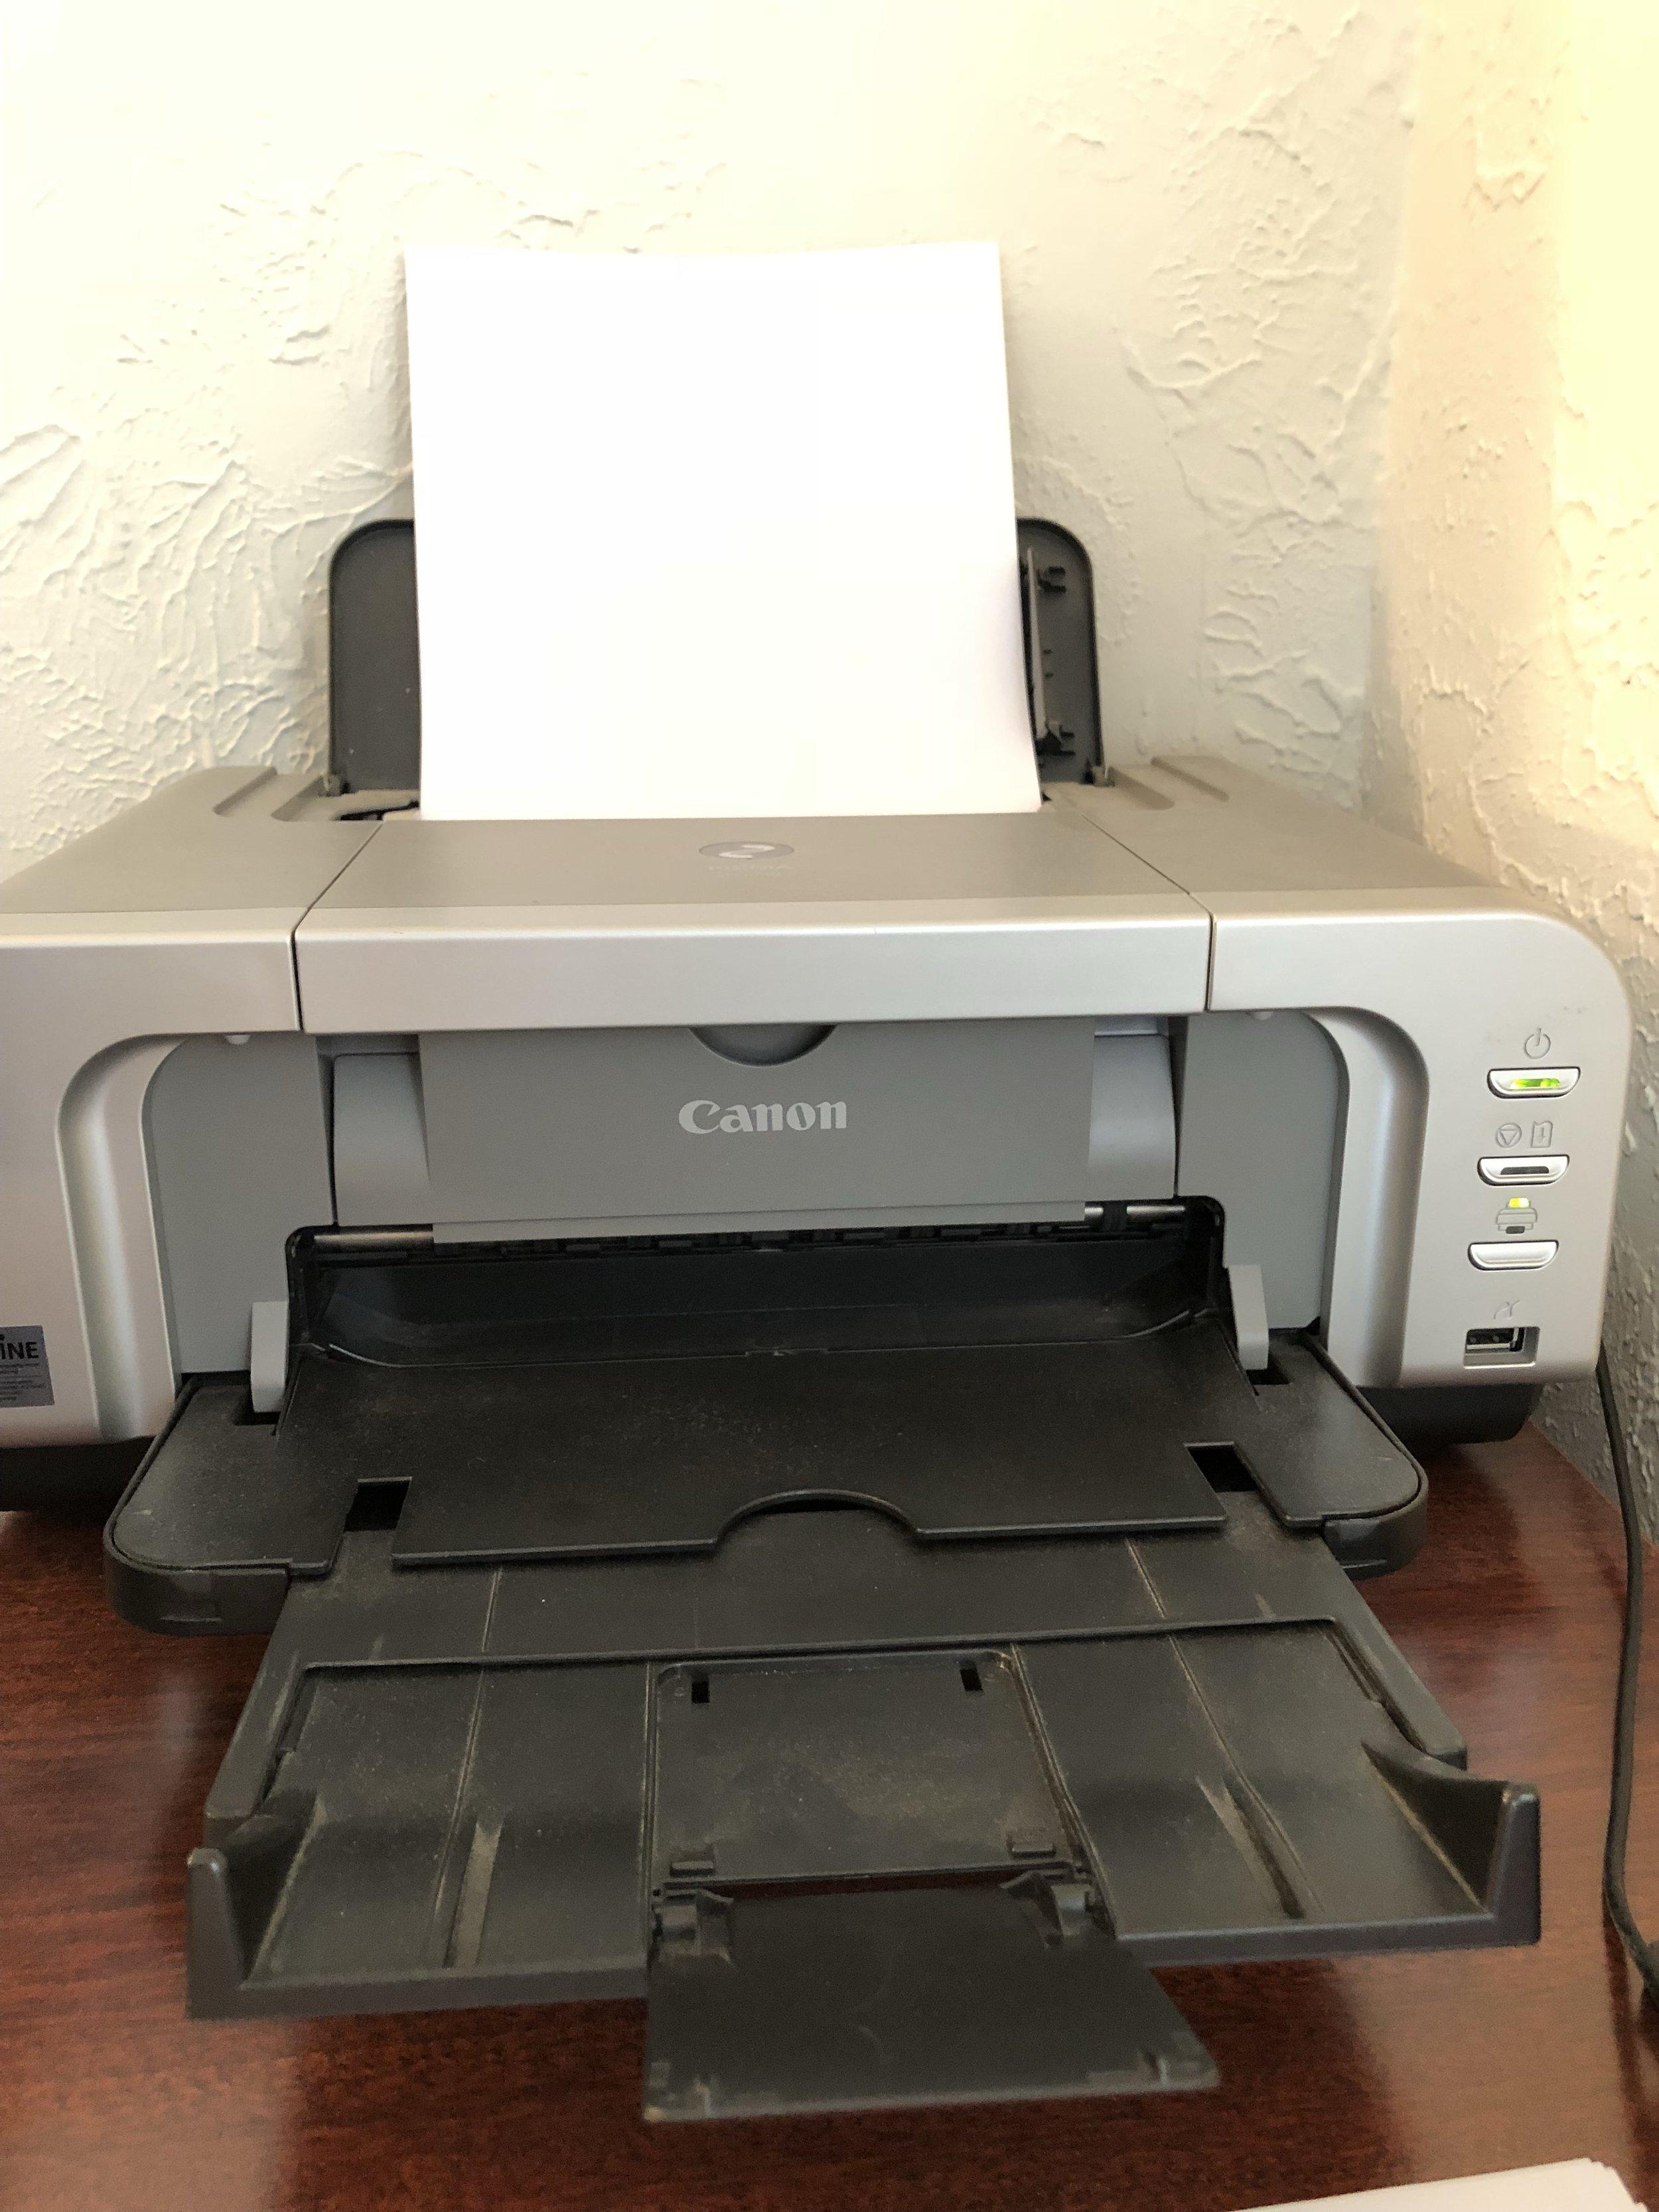 My beloved printer: a Canon Pixma iP4200